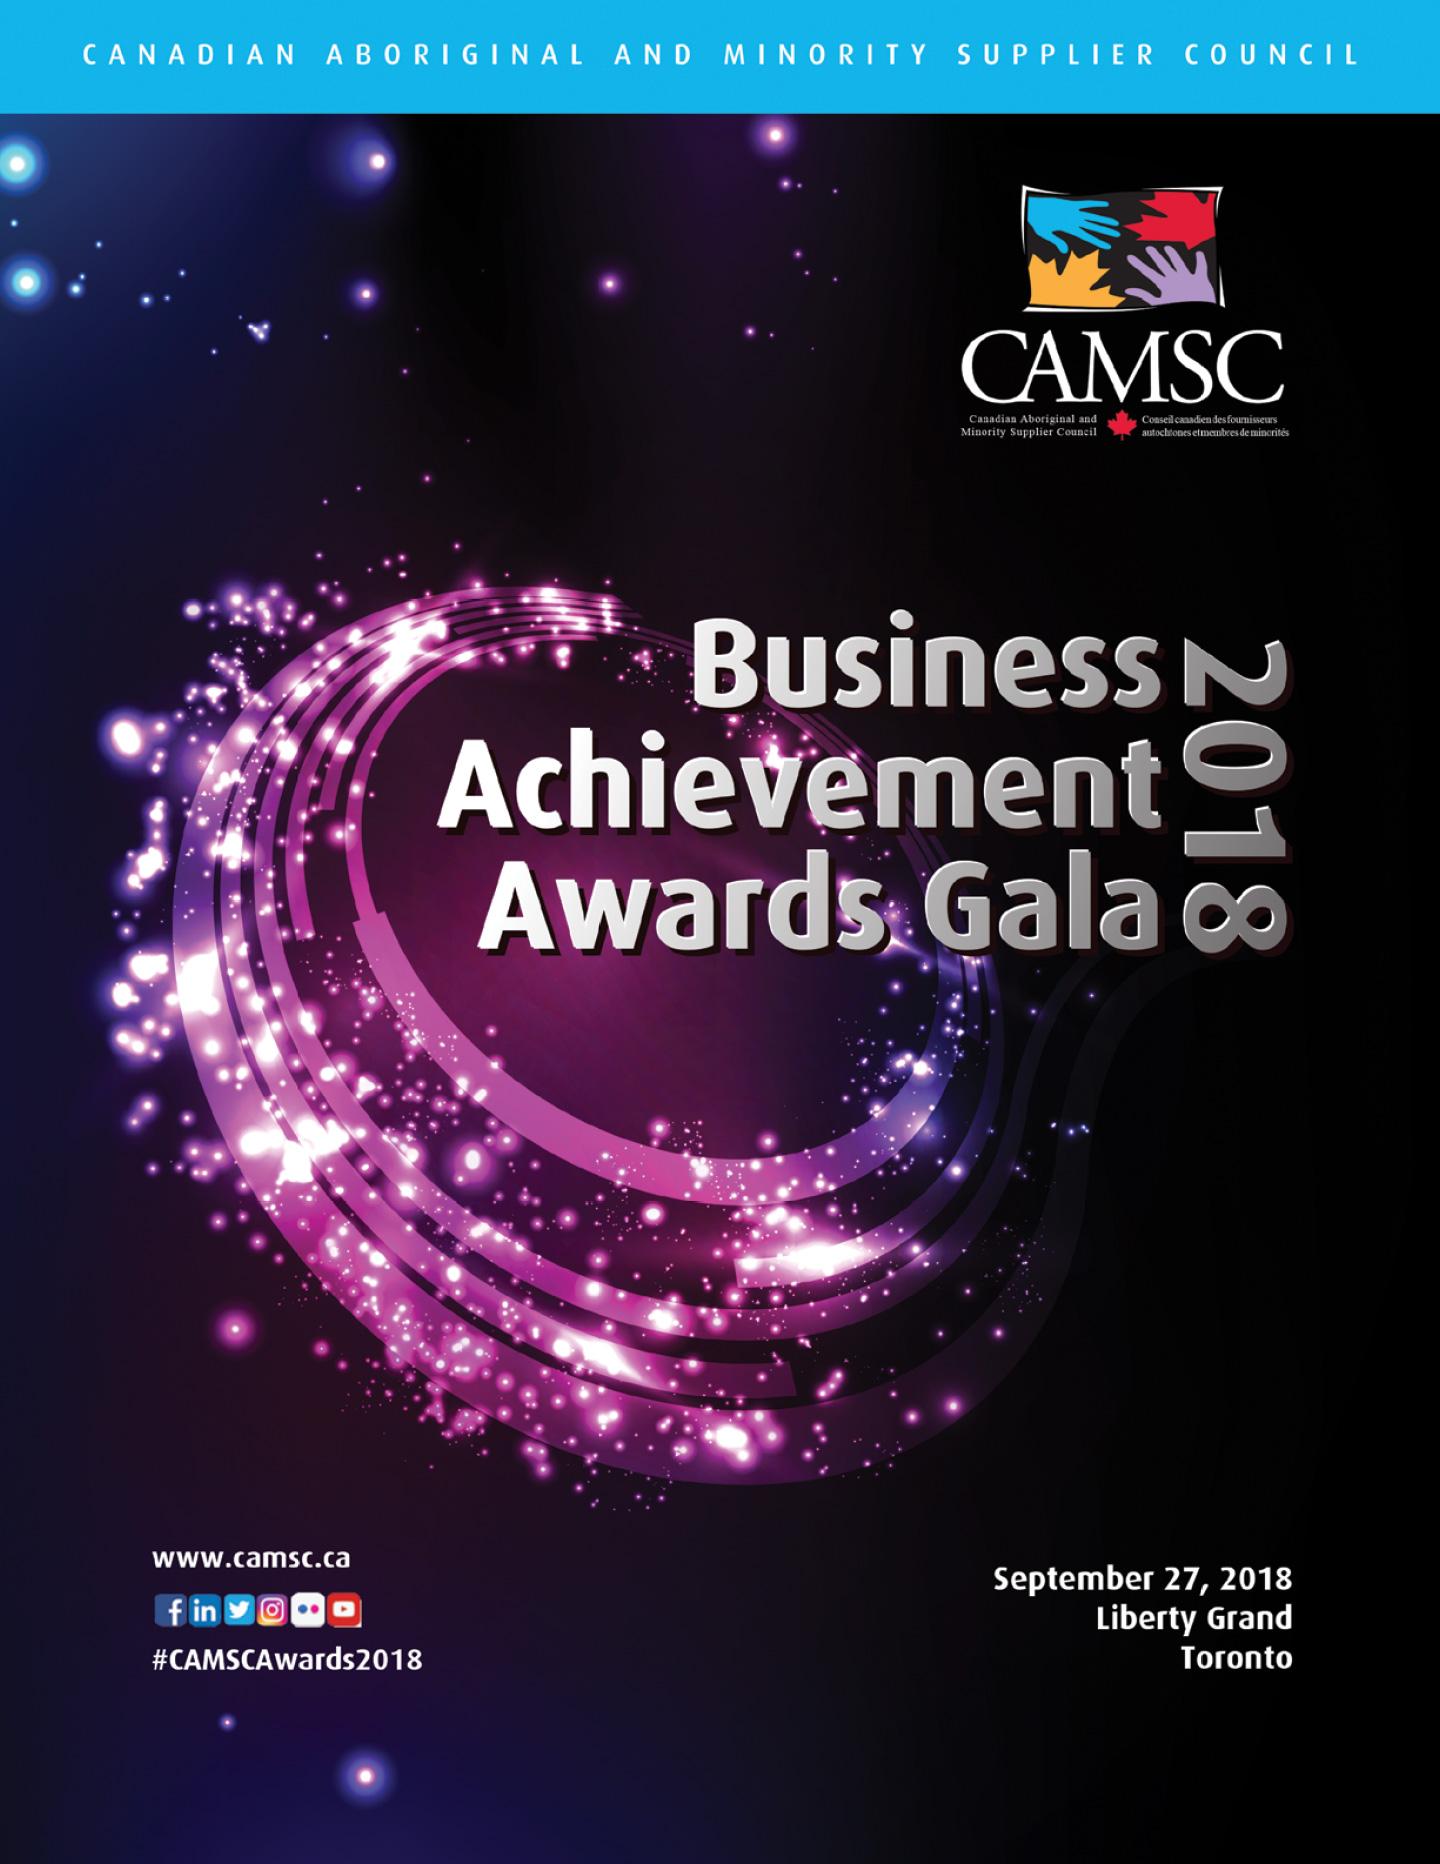 camsc_award2018